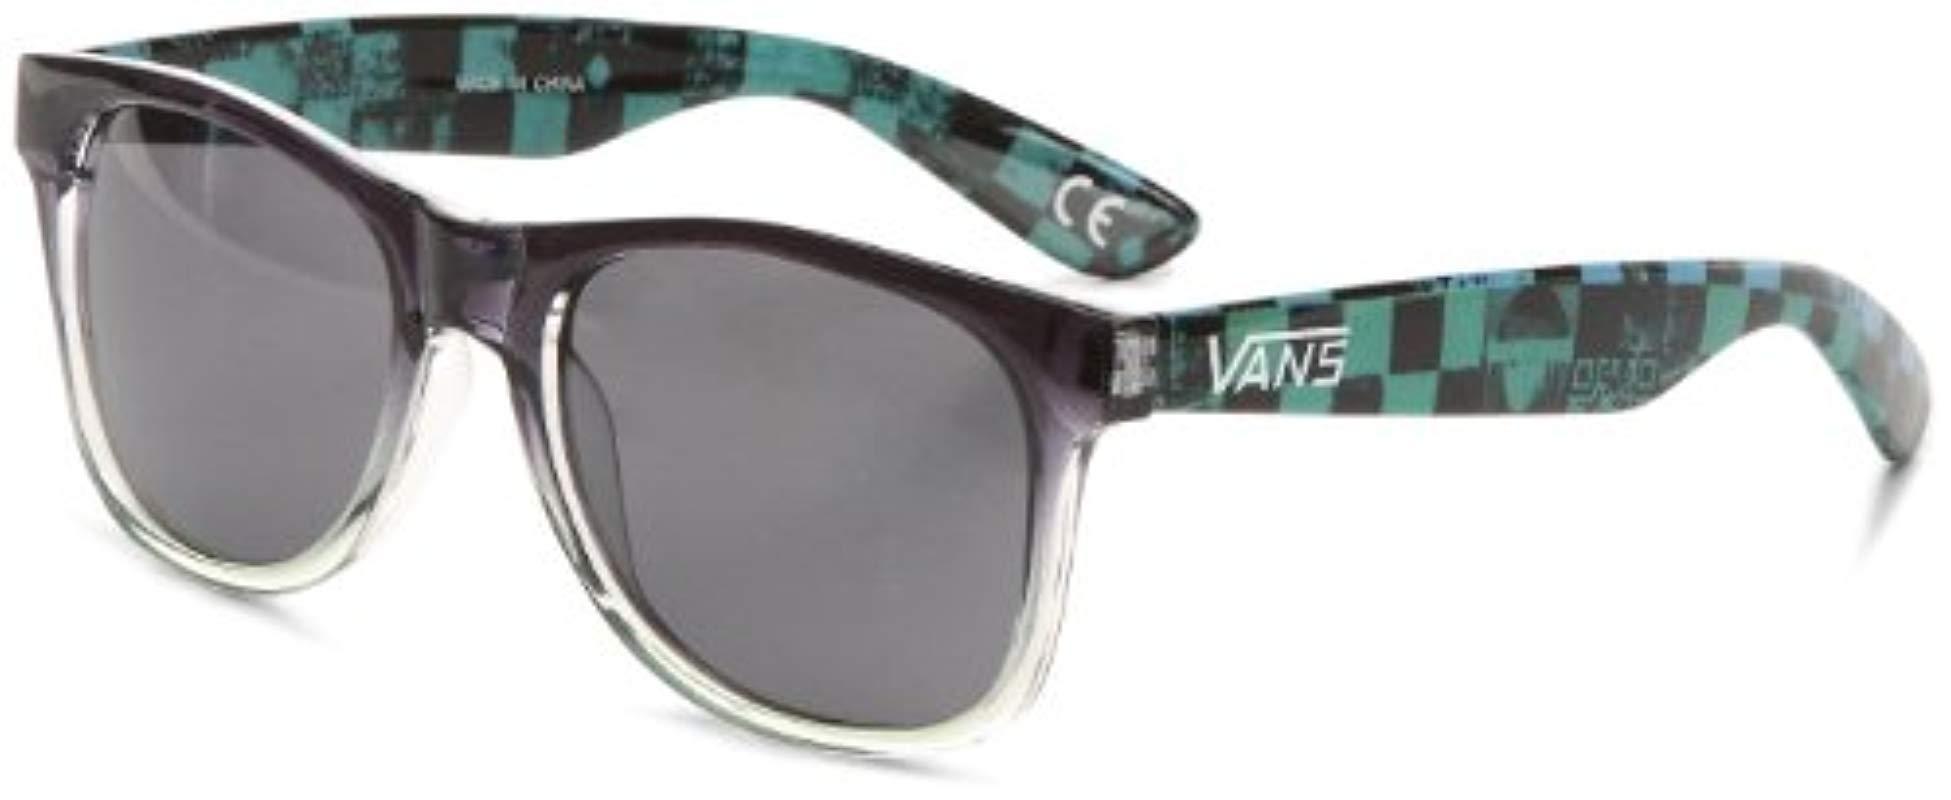 b00e20404898 Vans - Blue Spicoli 4 Shades Sunglasses for Men - Lyst. View fullscreen